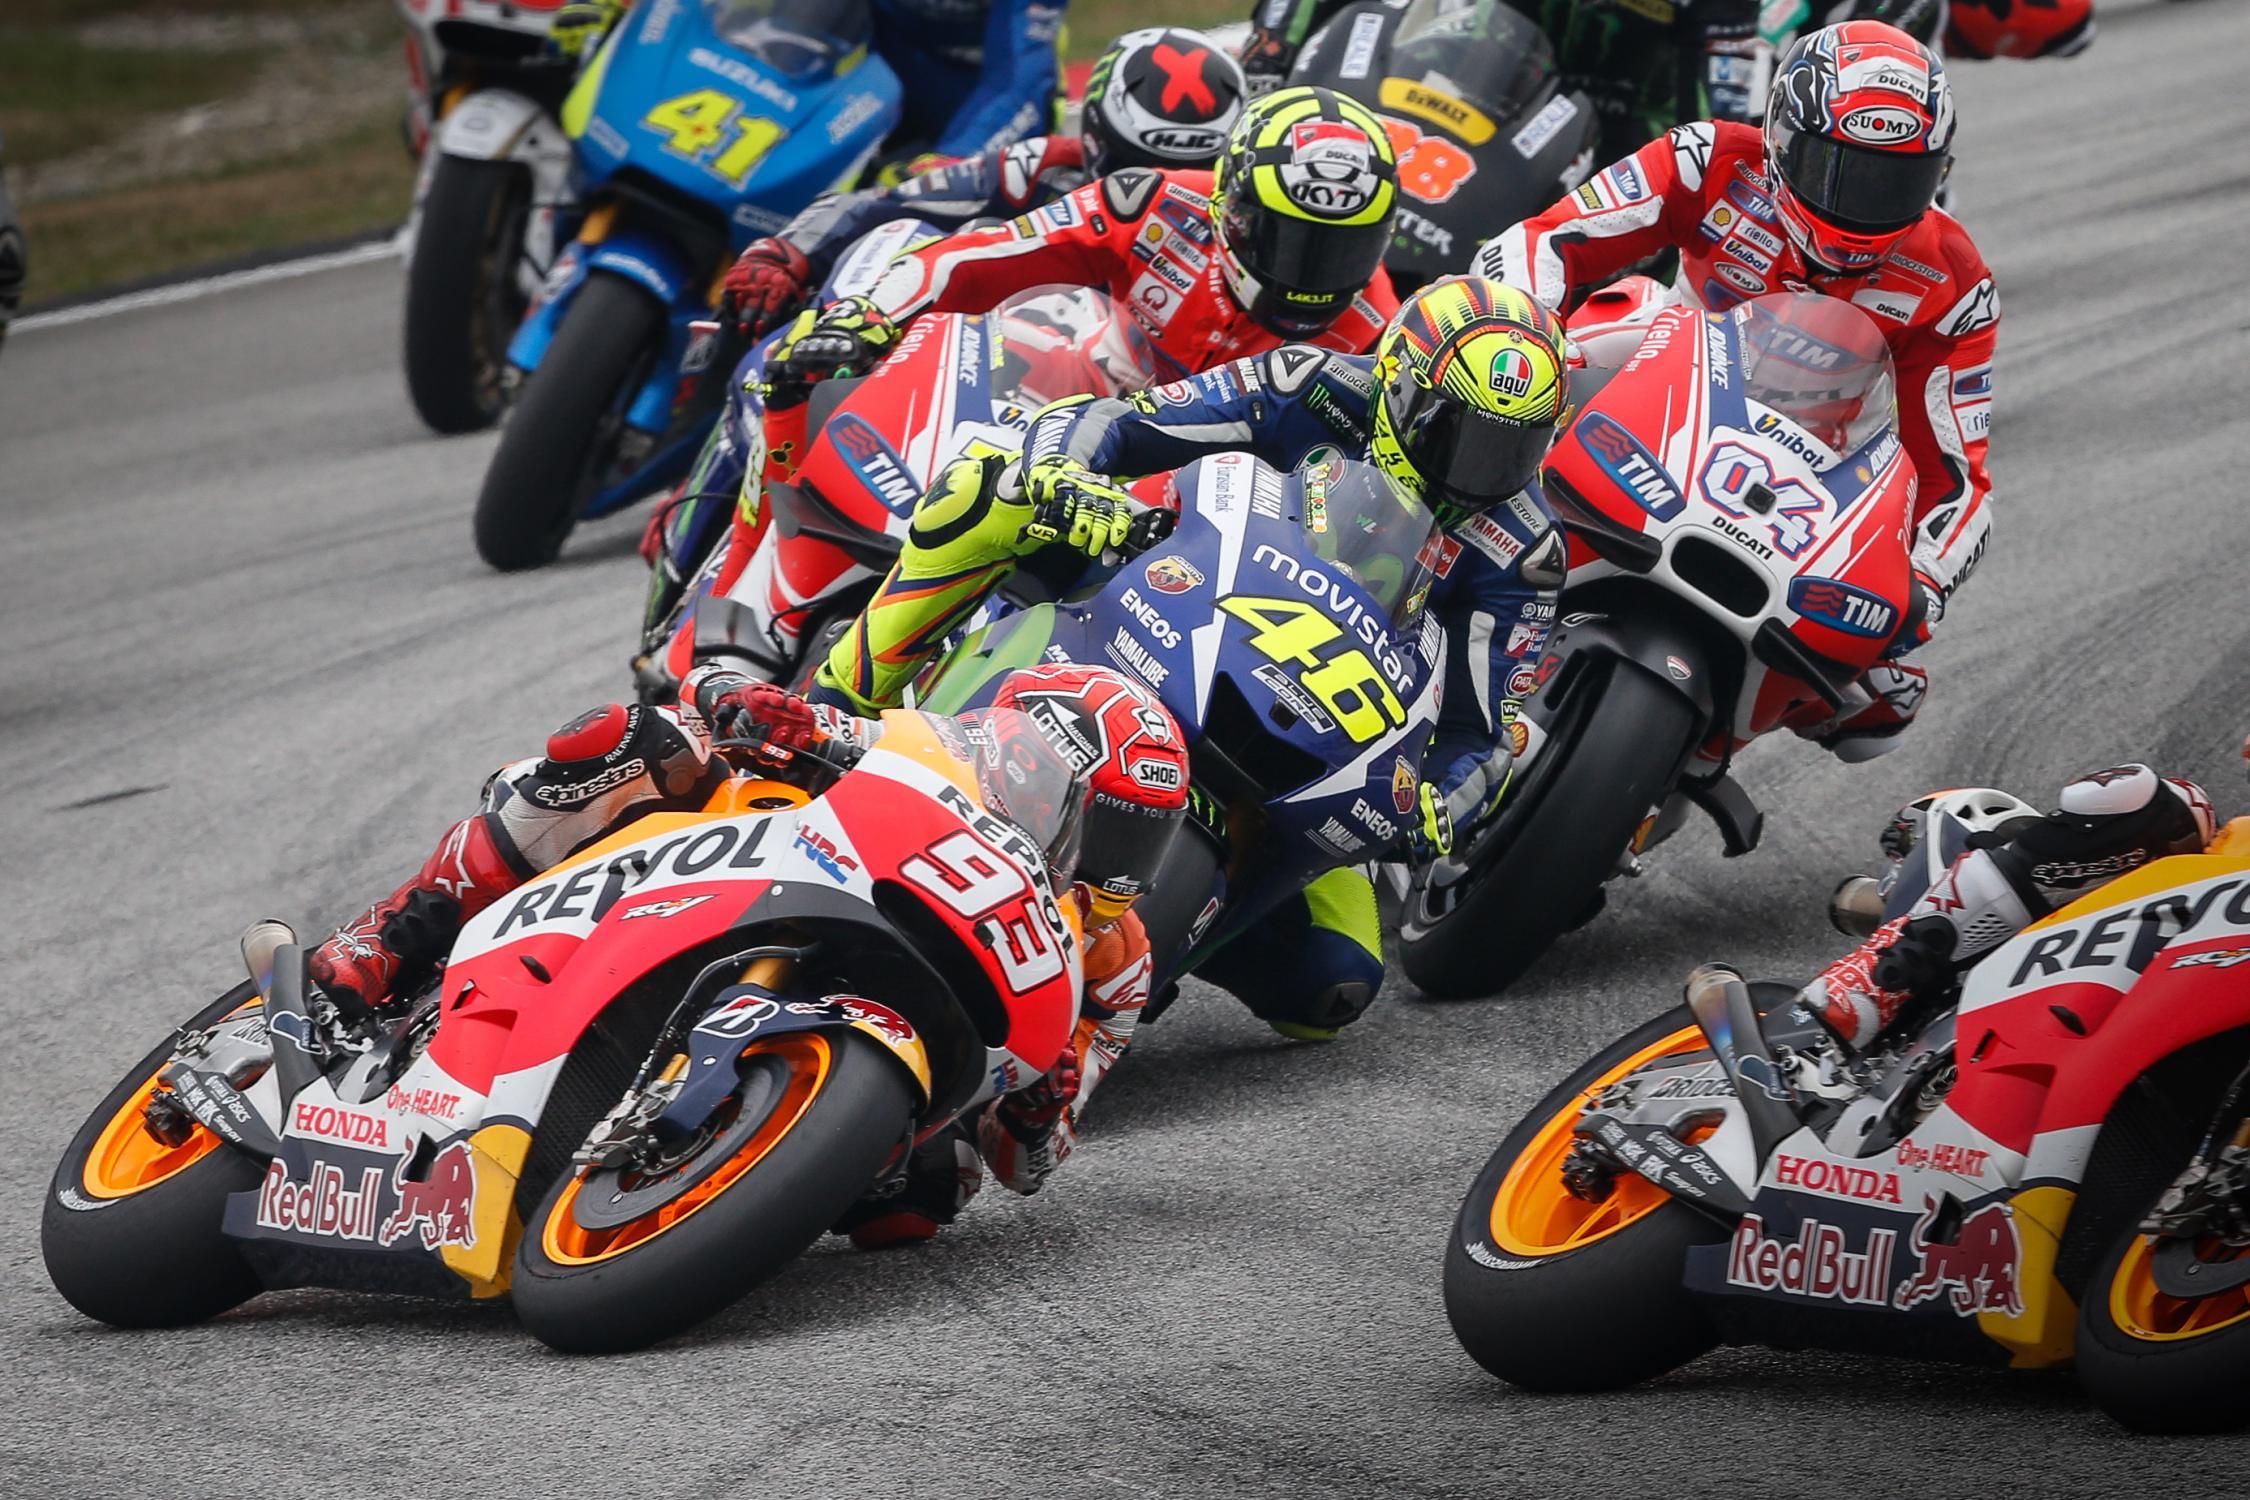 2016 MotoGP Provisional Calendar Includes Austria's Red Bull Ring - autoevolution